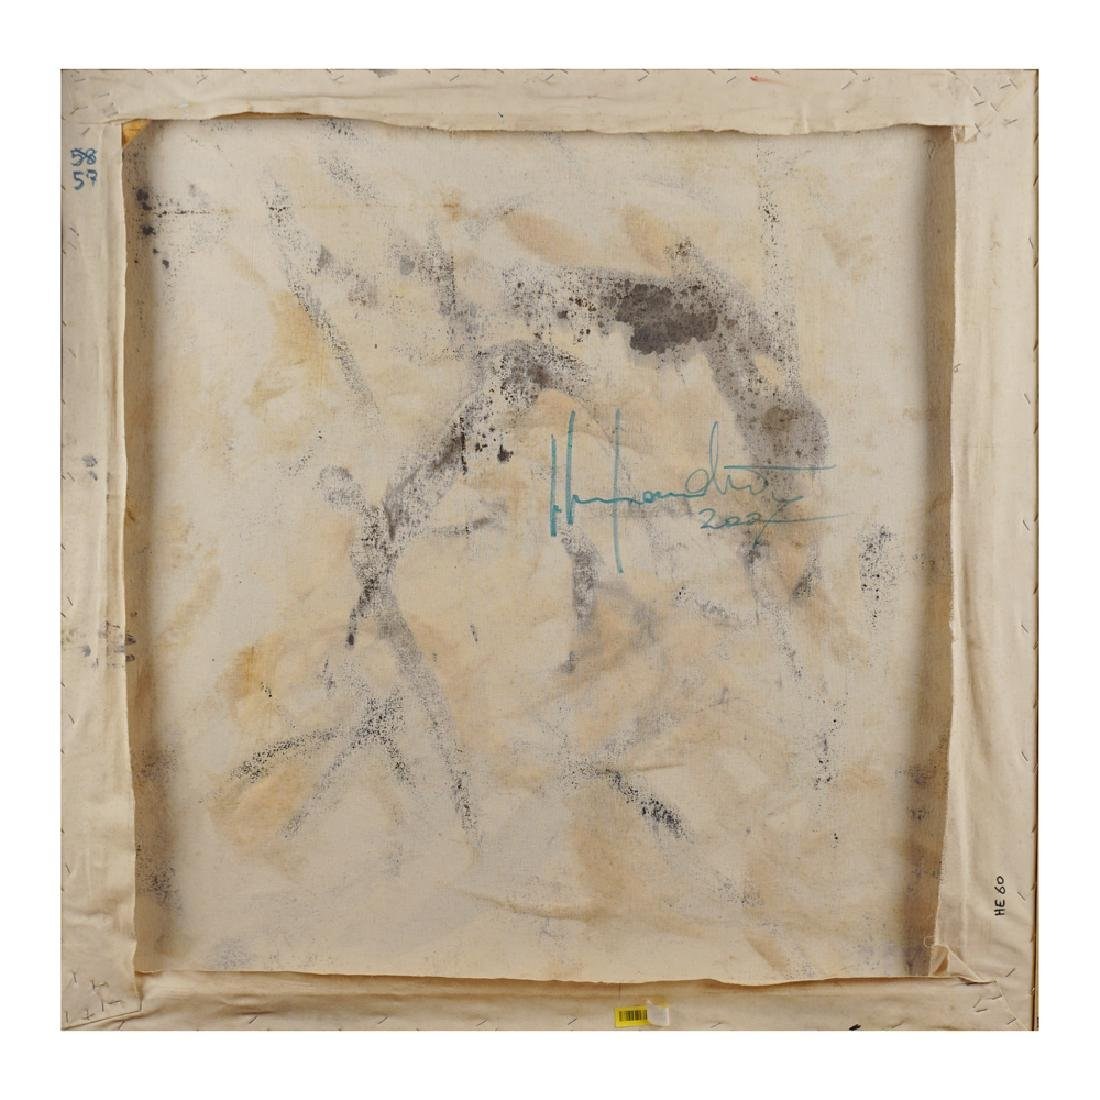 Silvio Formichetti Pratola Peligna 1969 100x100 cm. - 2